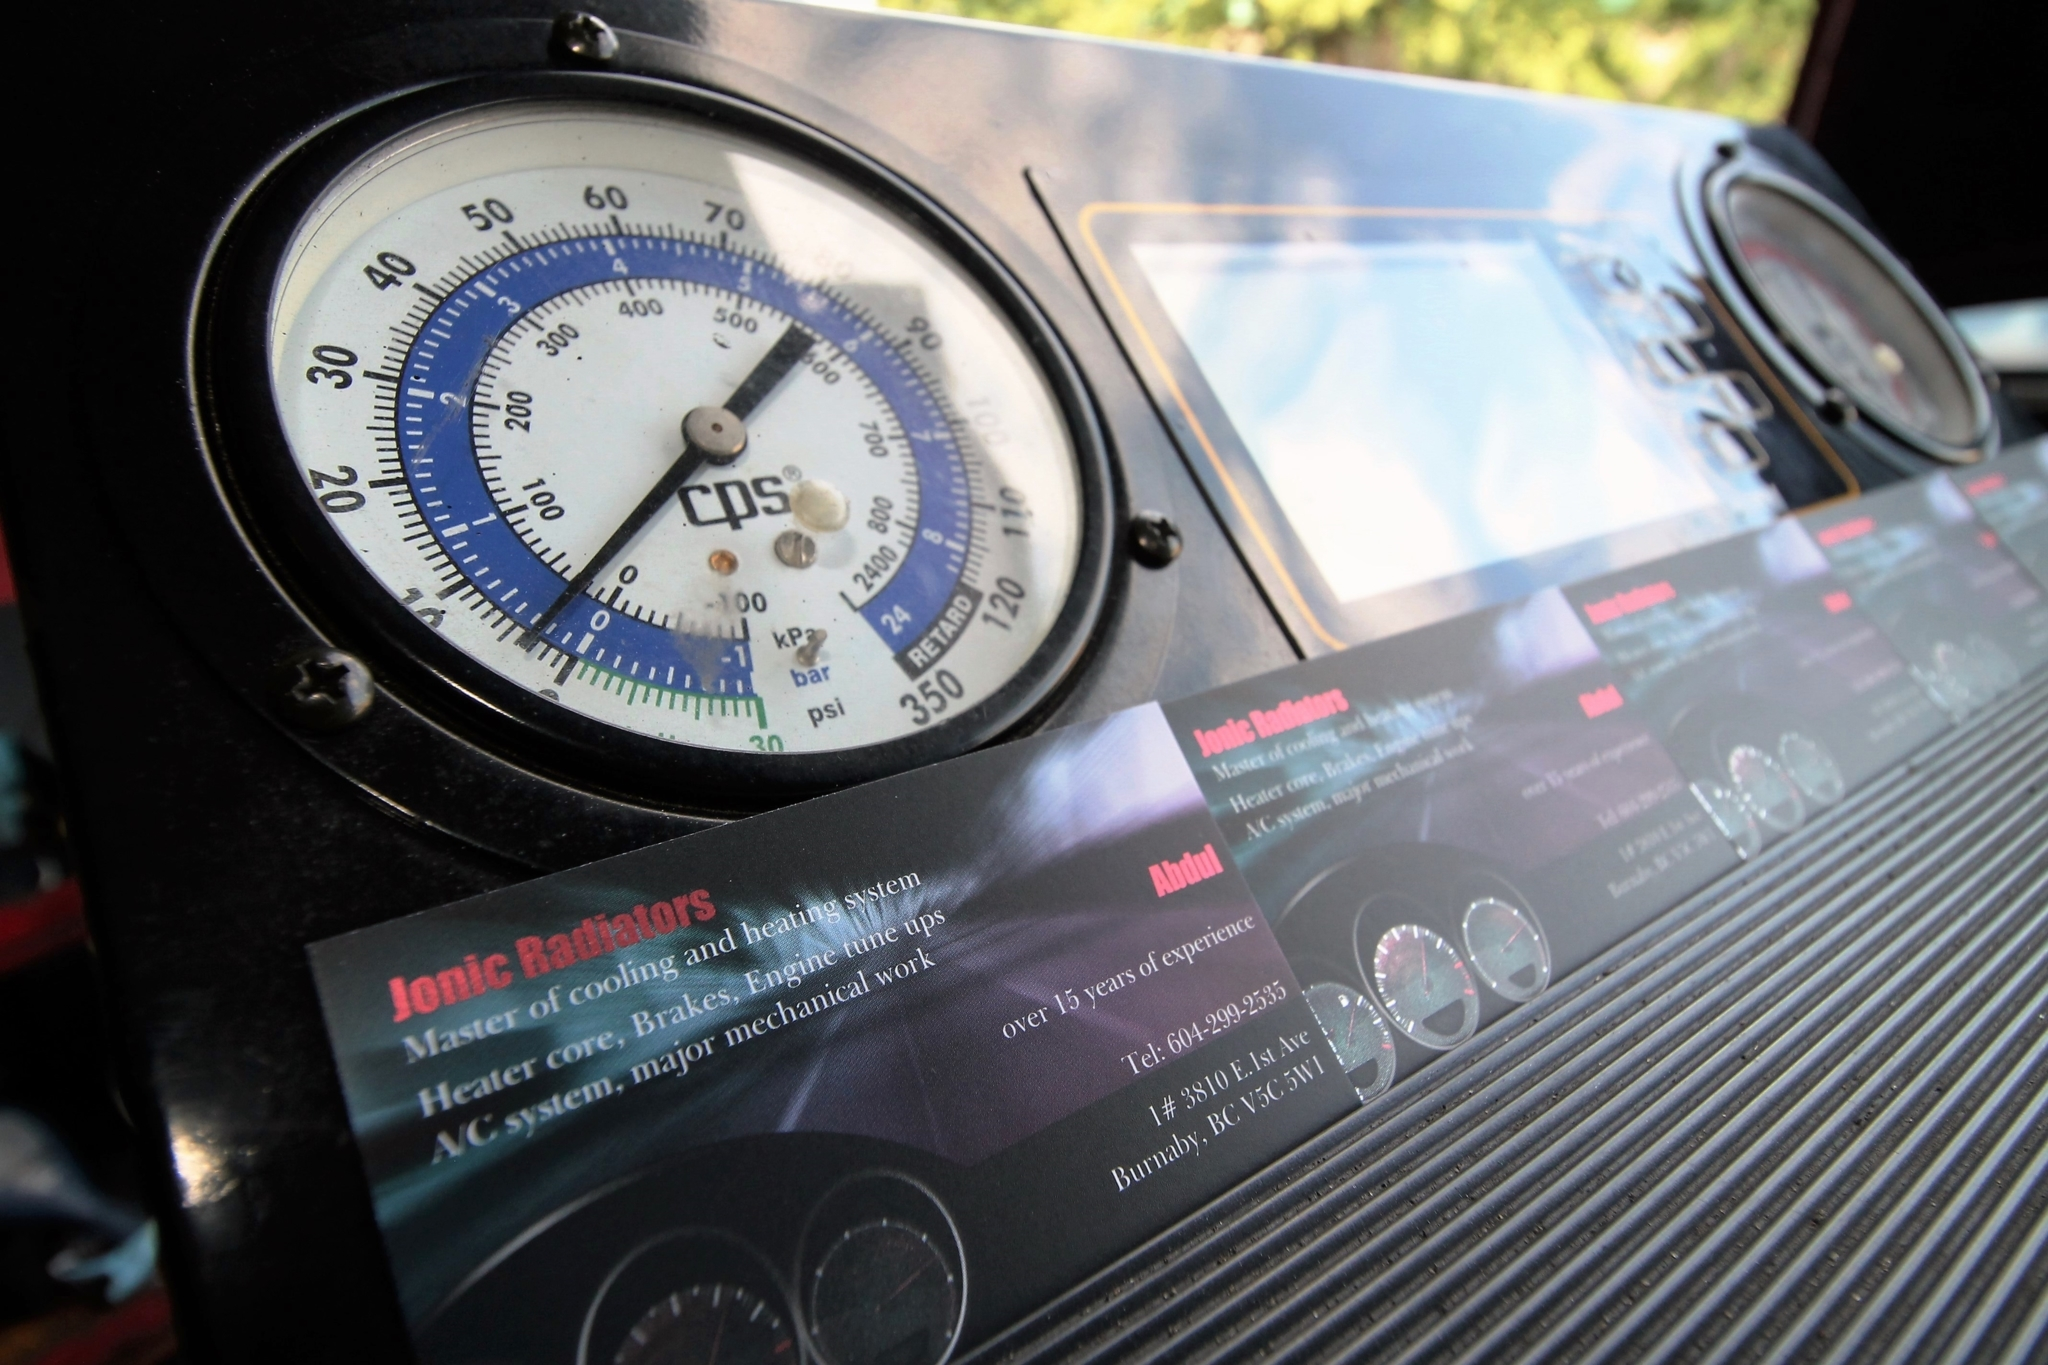 JoNic Radiators in Burnaby: top notch diagnostic equipment